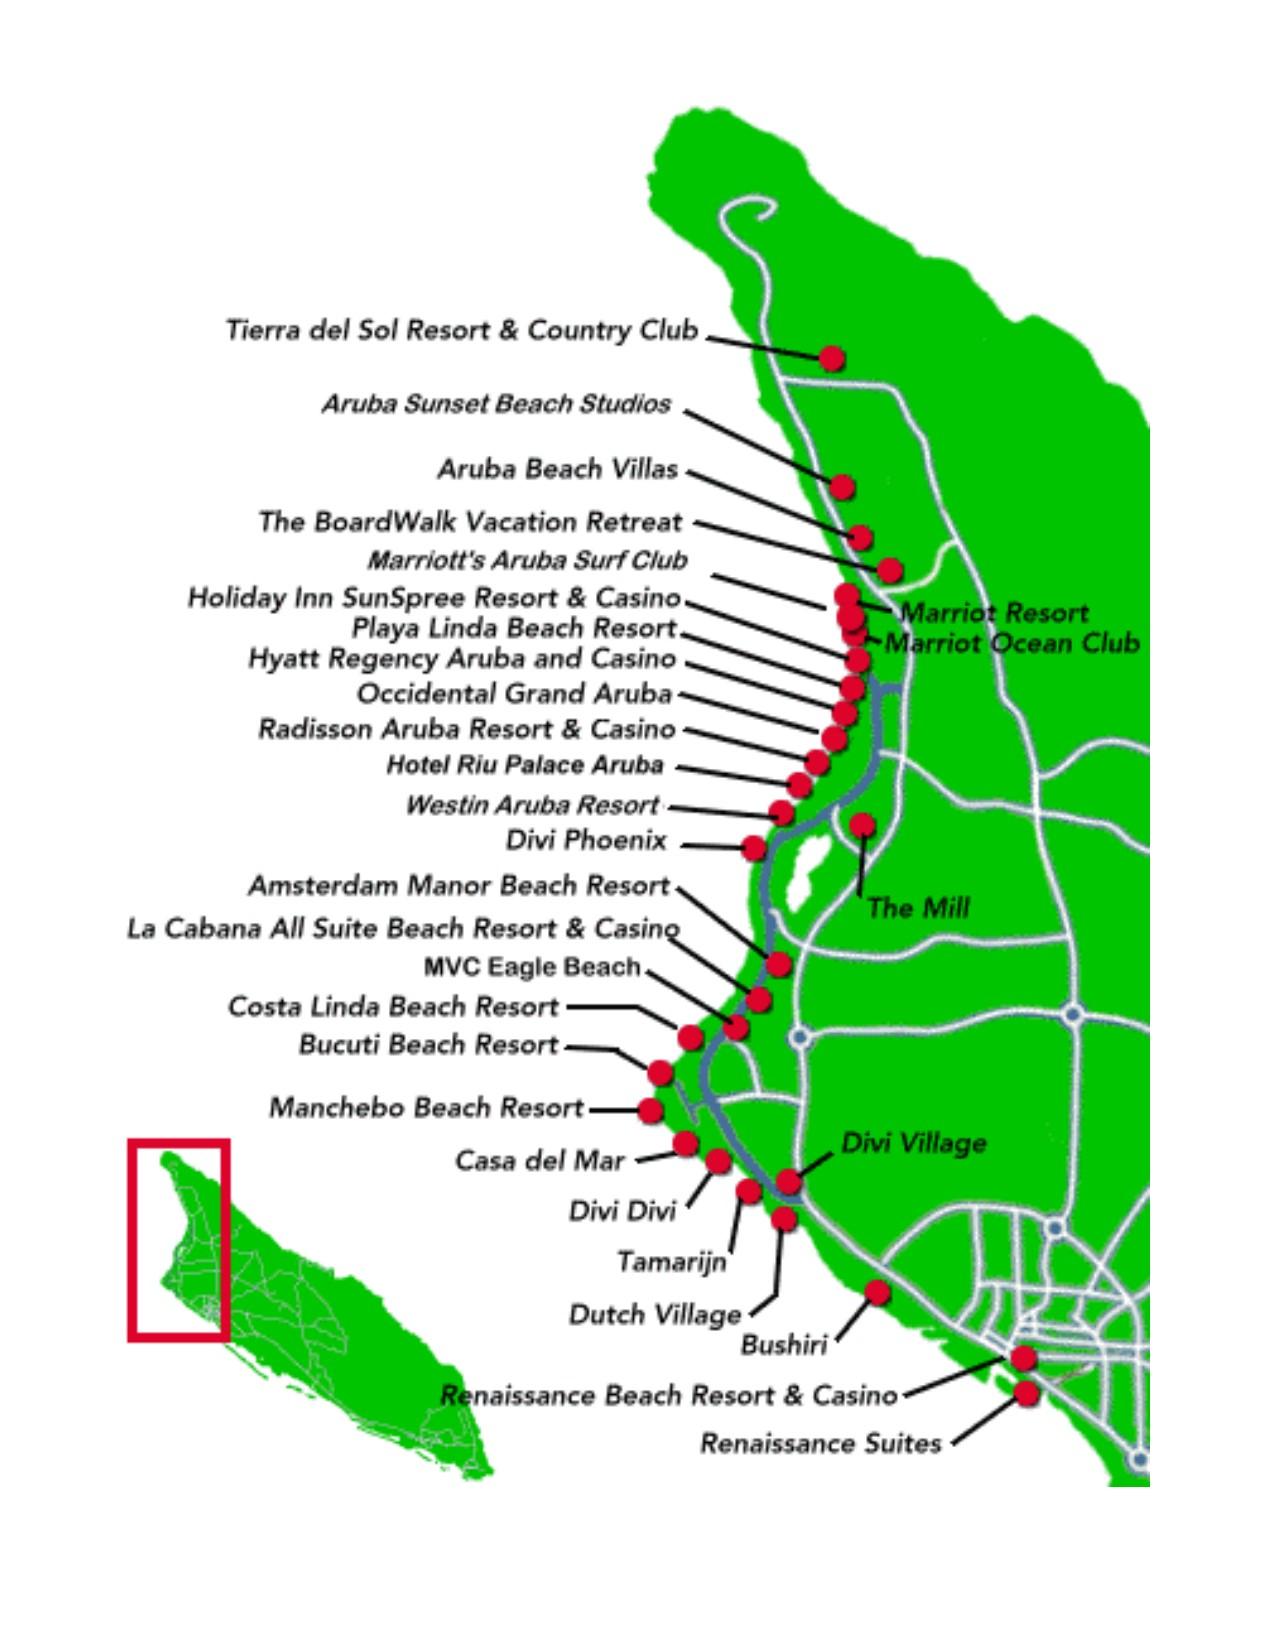 Aruba Hotel Map | Concierge Realty | Timeshare Sales & Rentals on tunisia map, cameroon map, greater antilles map, angola map, st. thomas map, virgin islands map, saba map, santa barbara map, libya map, jamaica map, korea map, mexico map, eritrea map, carribean map, madagascar map, netherlands map, senegal map, mozambique map, united states map, antigua map, lesotho map, algeria map, caribbean map, st. martin map, namibia map, dominican republic map, kenya map, burundi map, sudan map, puerto rico map, ghana map, ethiopia map, rwanda map, zimbabwe map, morocco map, peru map, egypt map, niger map,